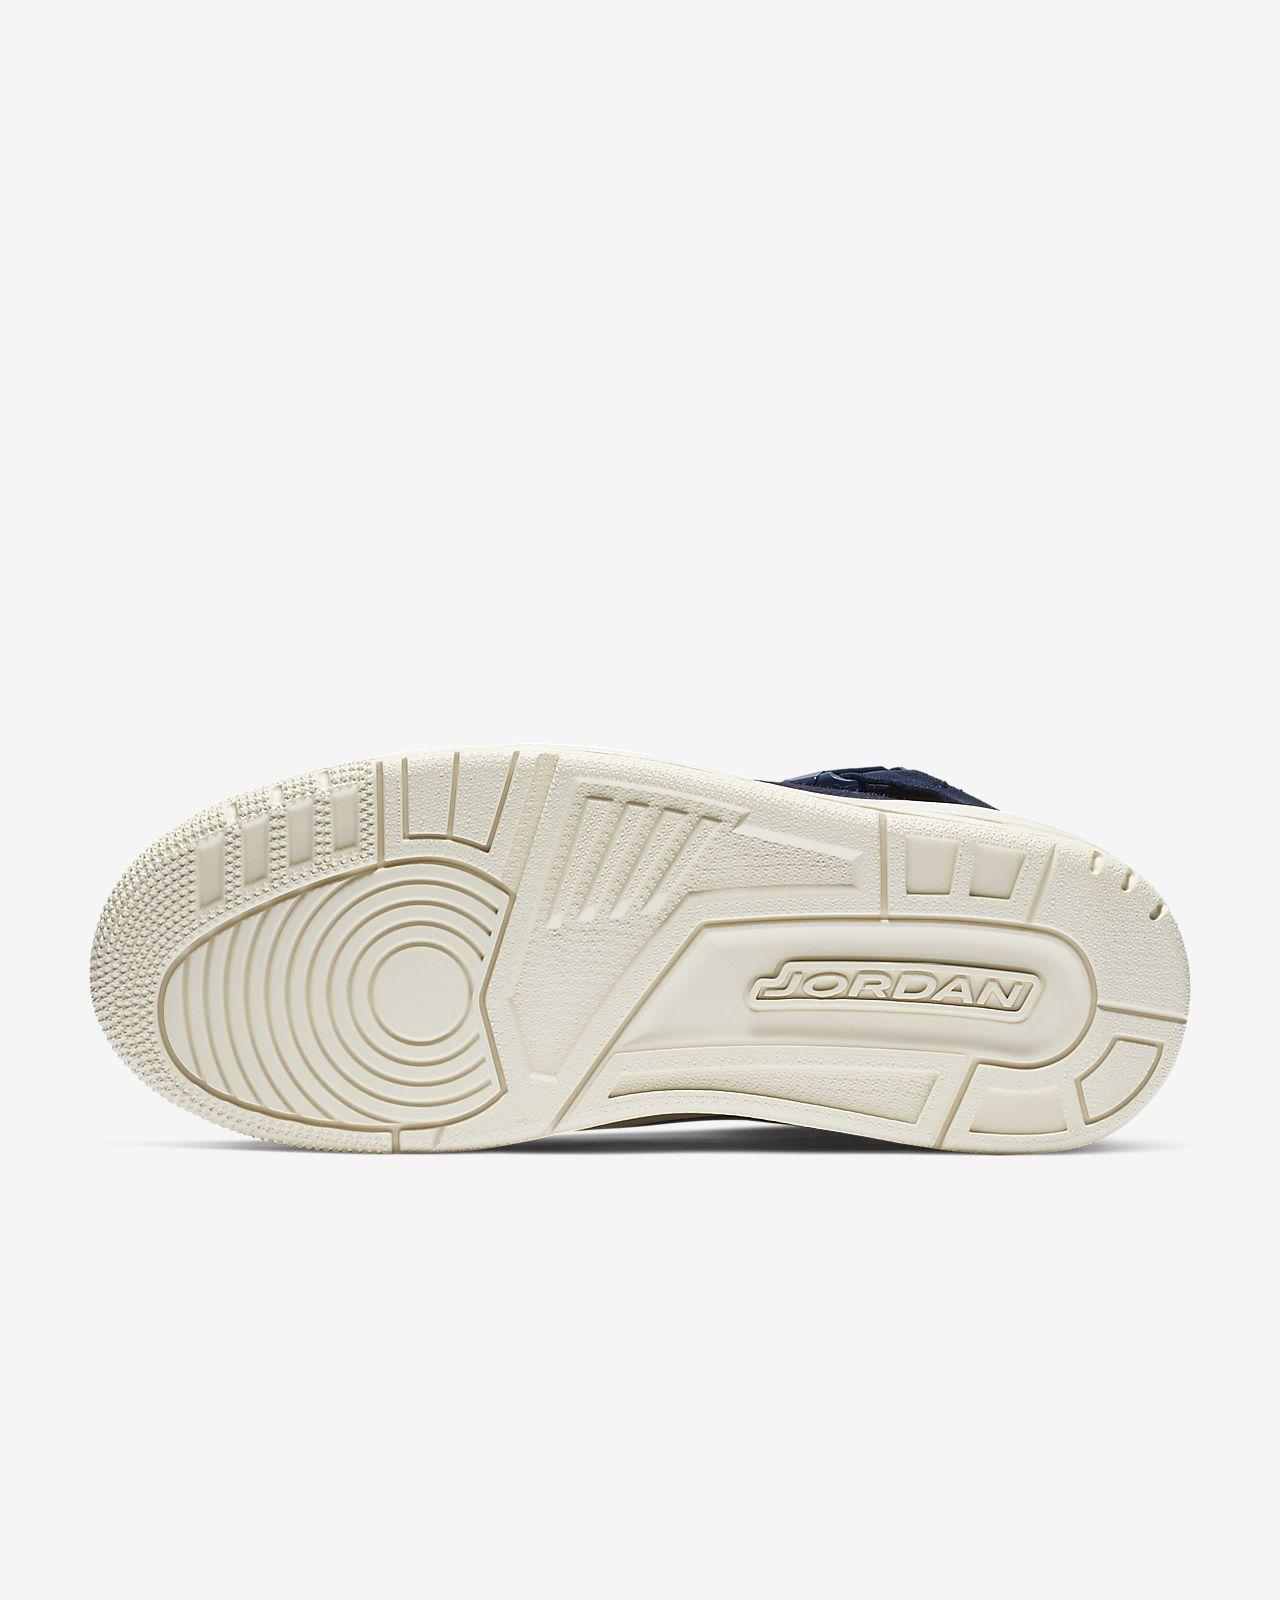 low priced 5c67c db9cd Air Jordan 3 Retro Explorer XX-sko til kvinder. Nike.com DK